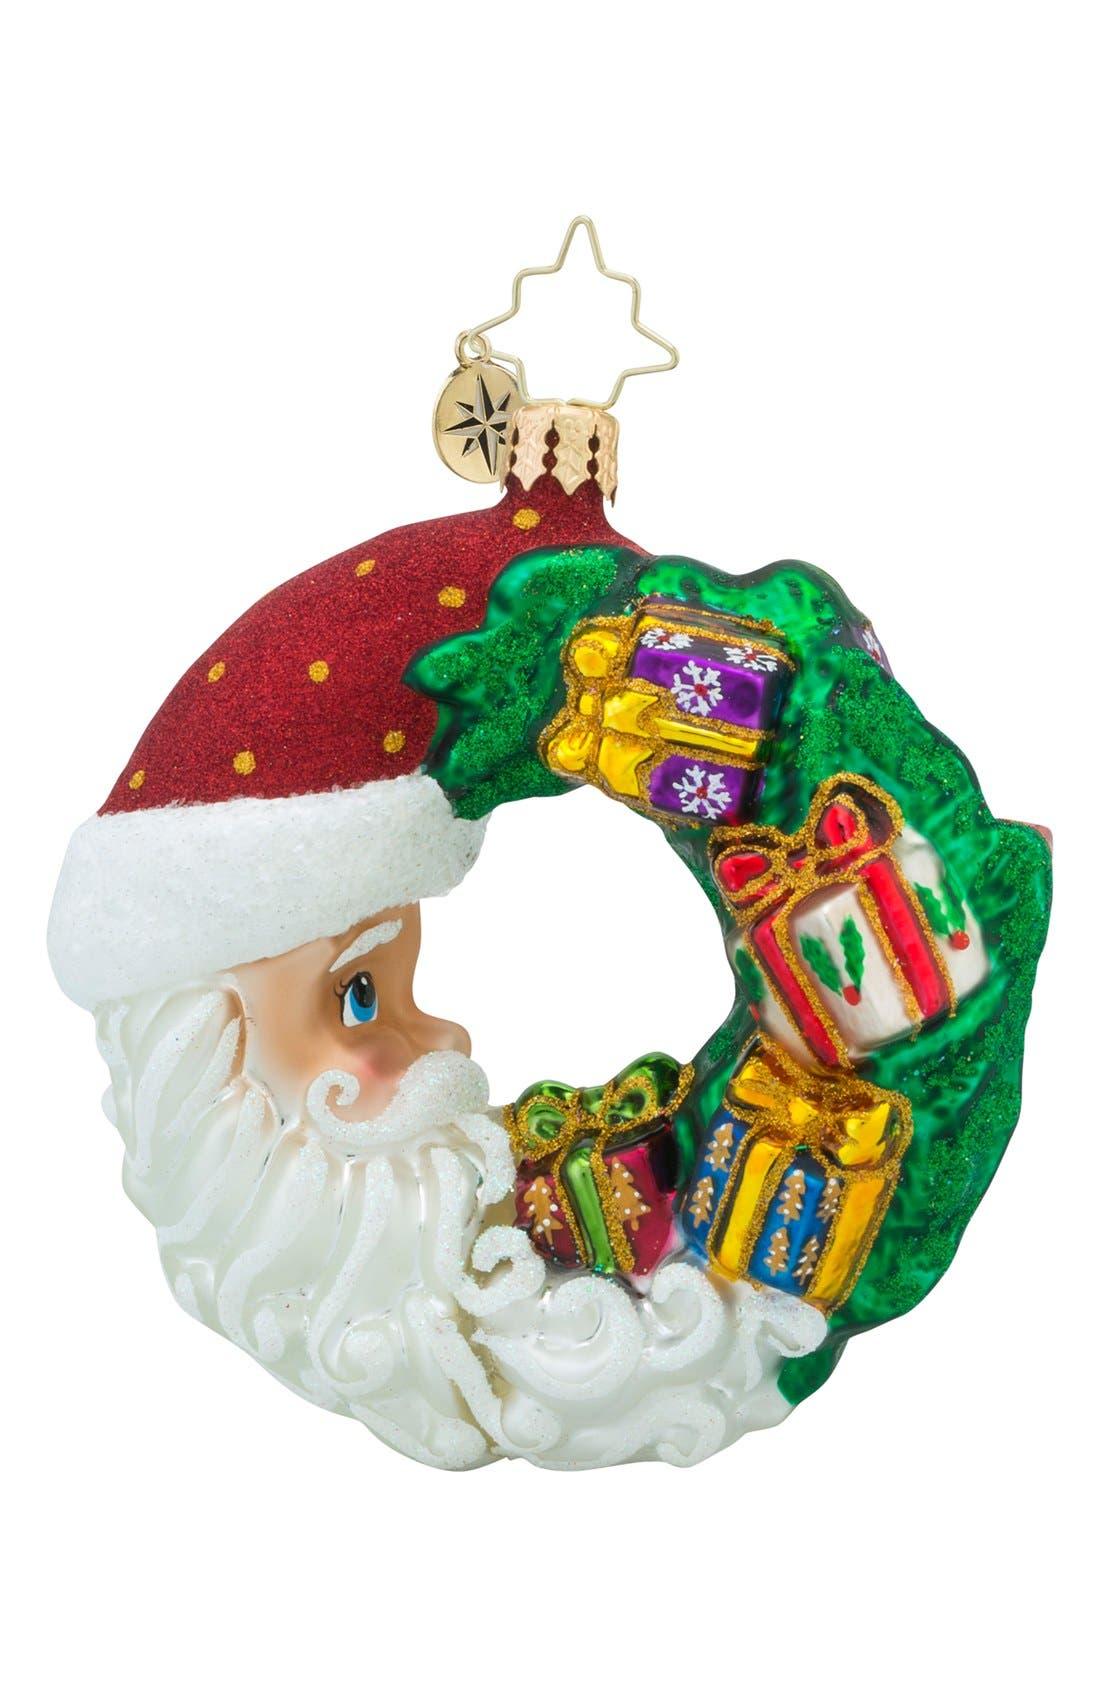 'Crescent Christmas' Santa Ornament,                             Main thumbnail 1, color,                             300